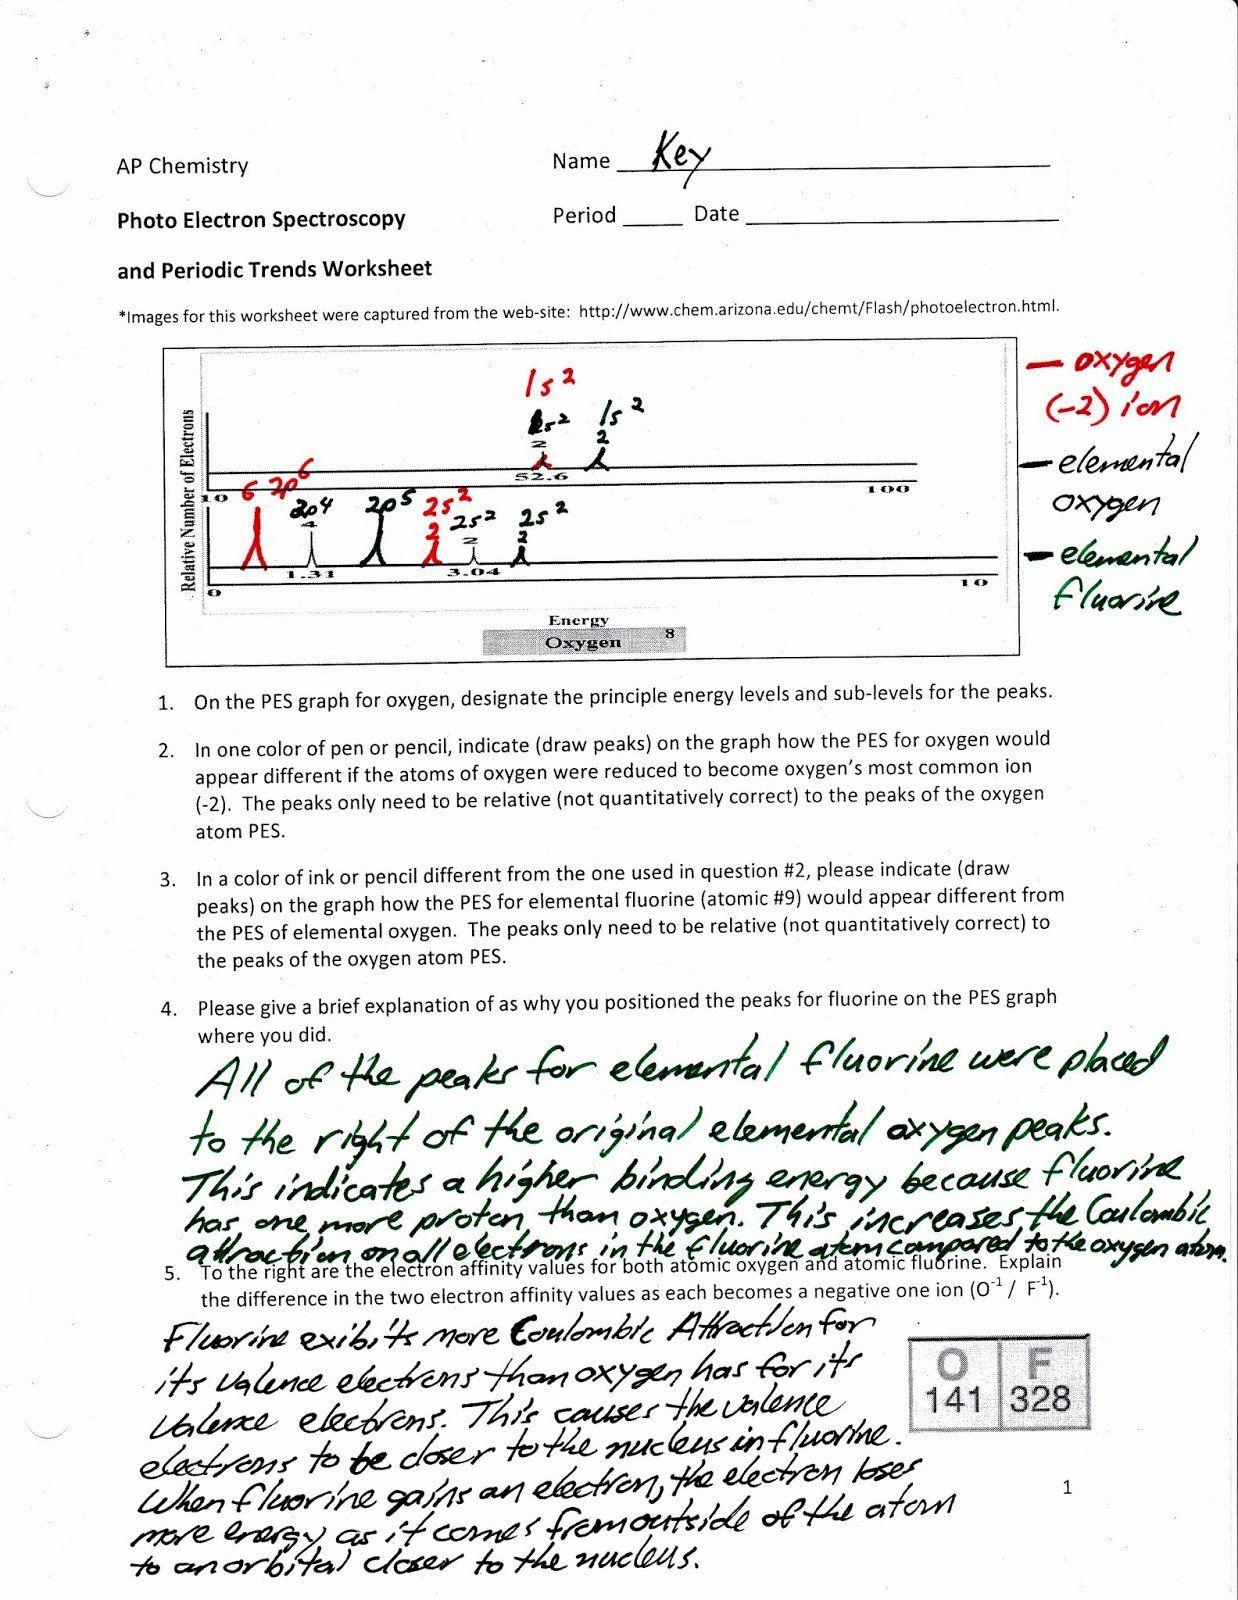 Photoelectron Spectroscopy Worksheet Answers Elegant